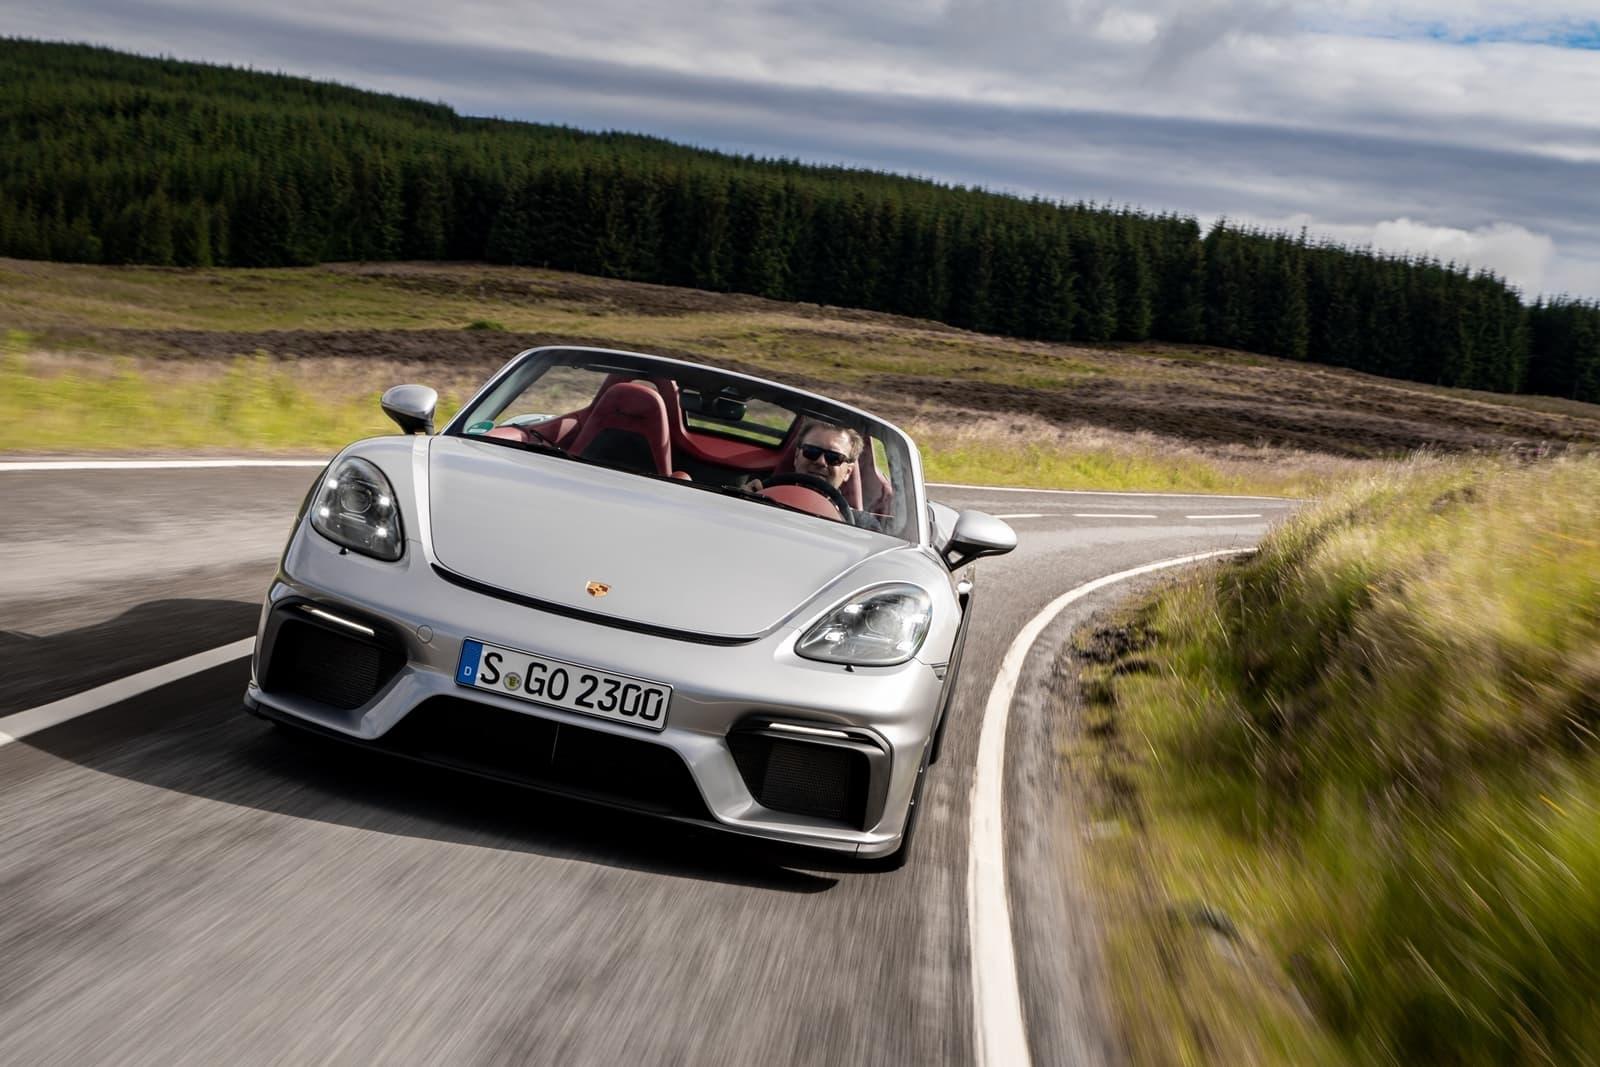 Porsche 718 Spyder 0719 025